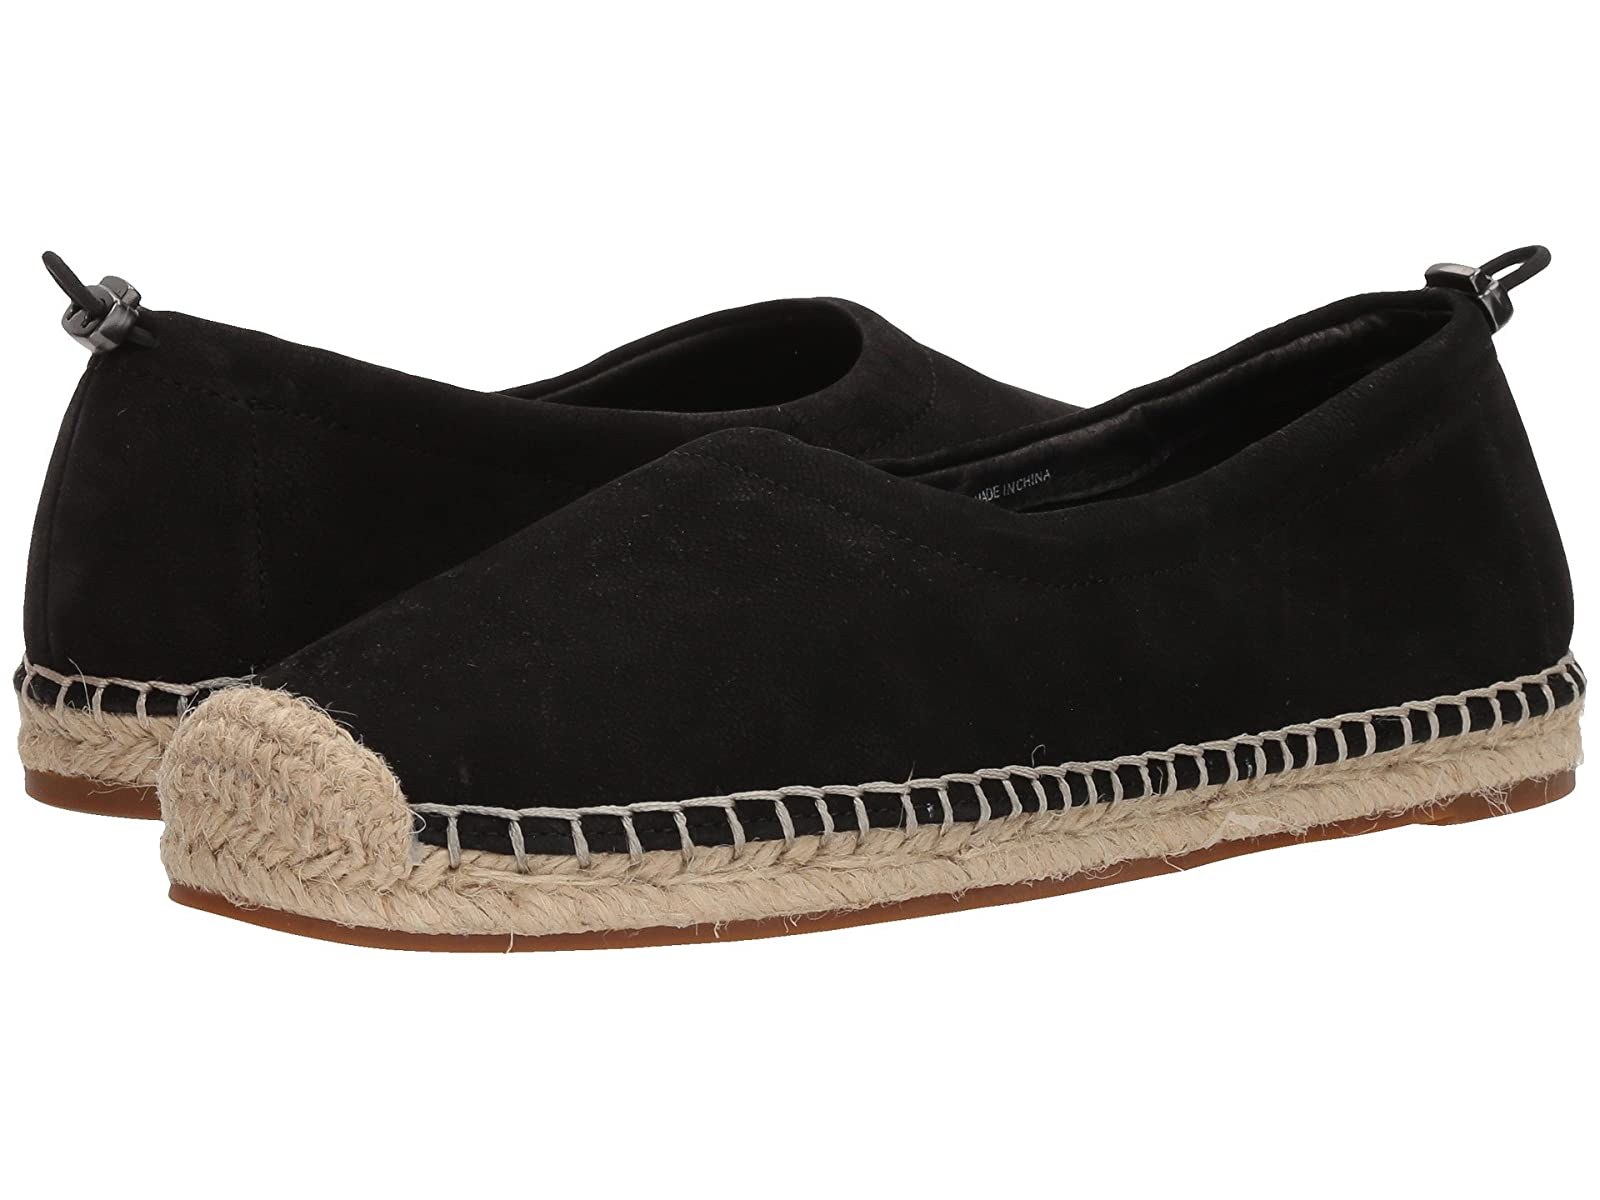 Eileen Fisher Bali EspadrilleCheap and distinctive eye-catching shoes